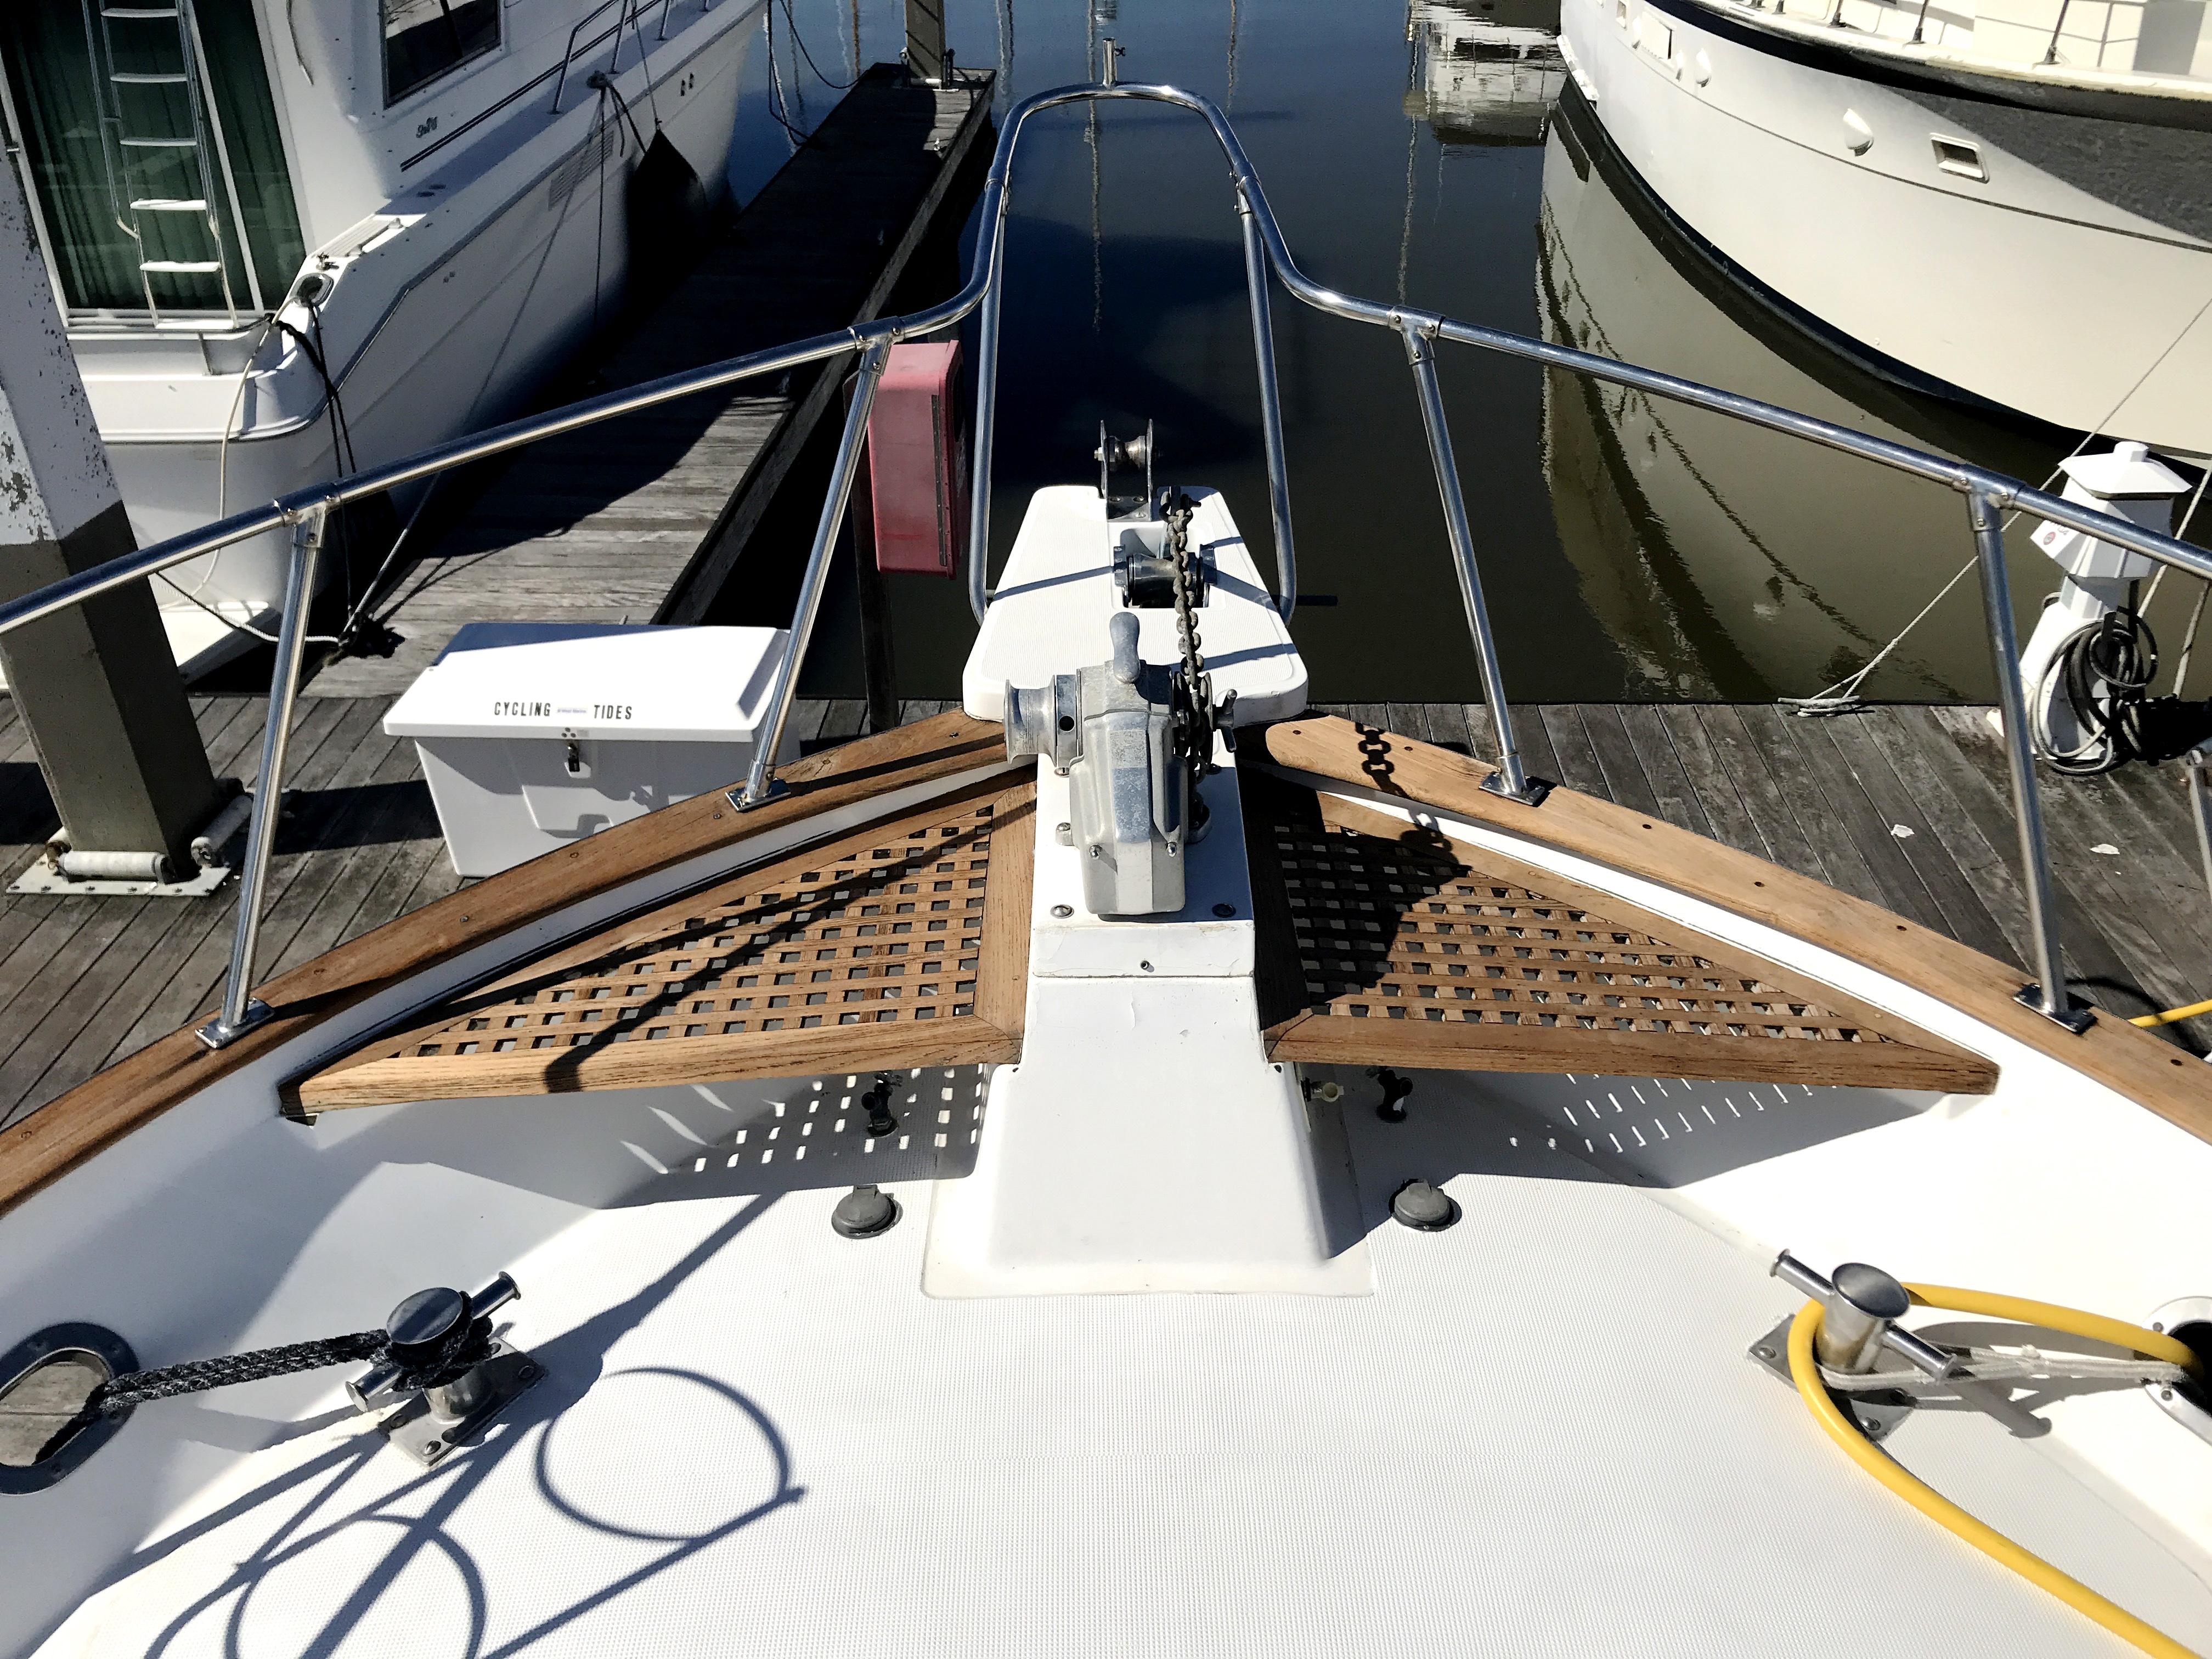 Sea Ranger SUNDECK - bow pulpit and anchor windlass